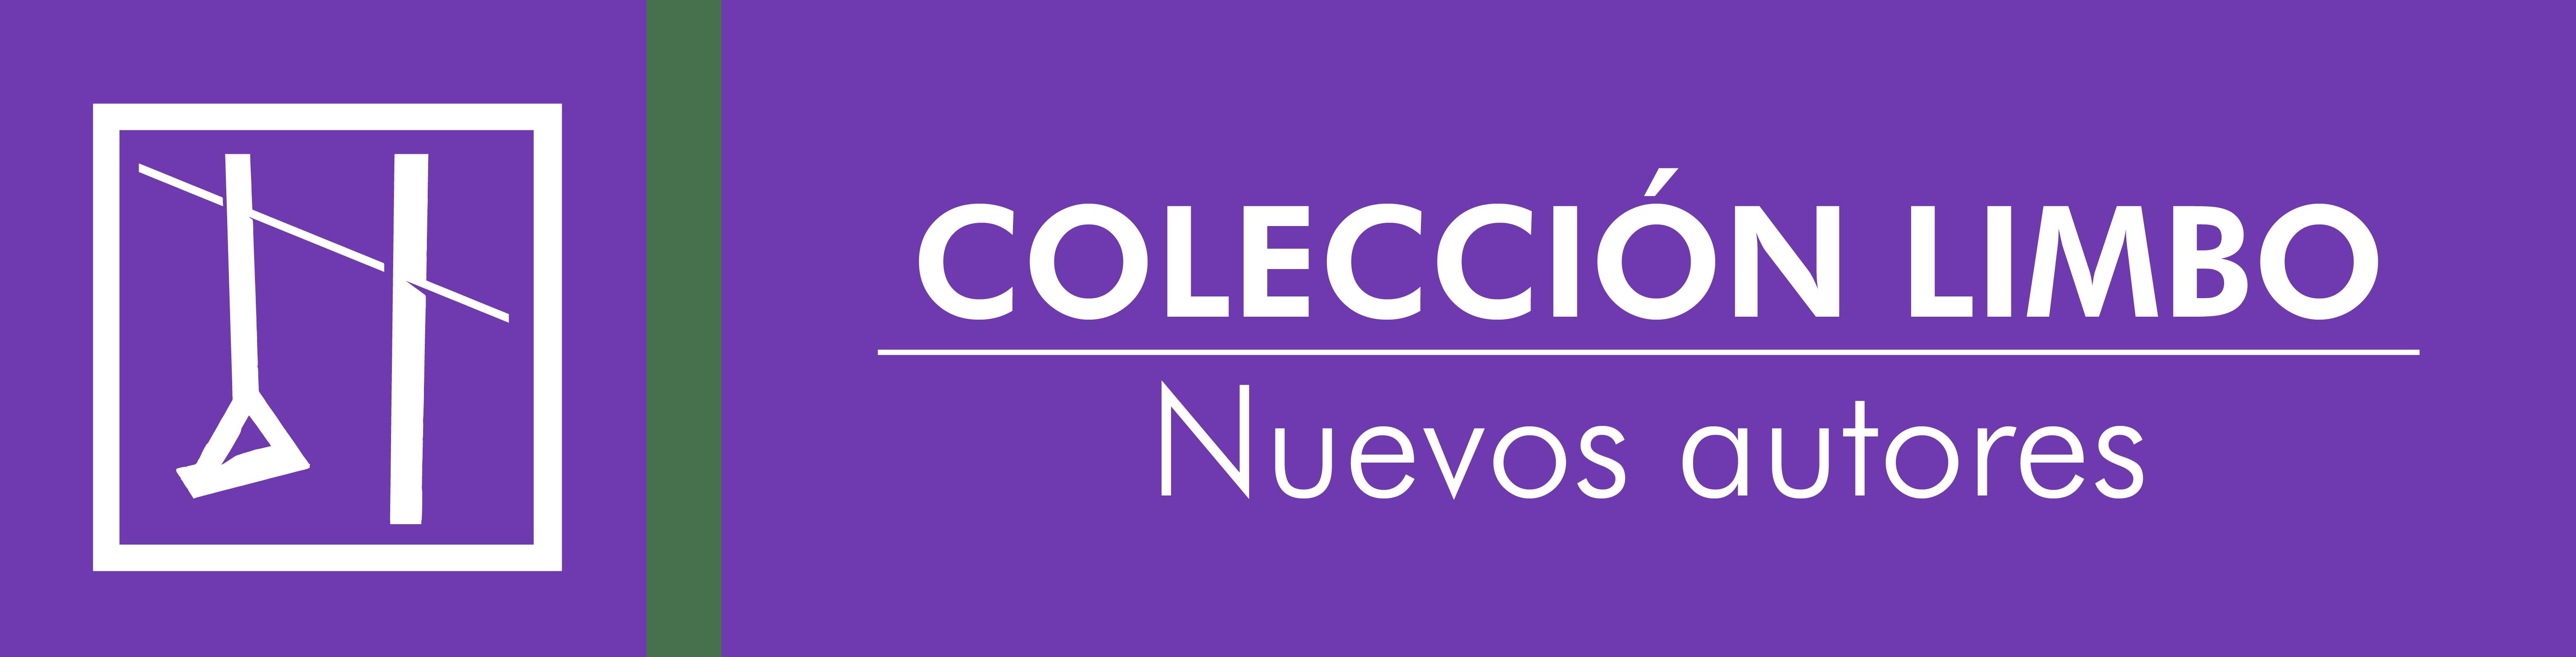 CC-09